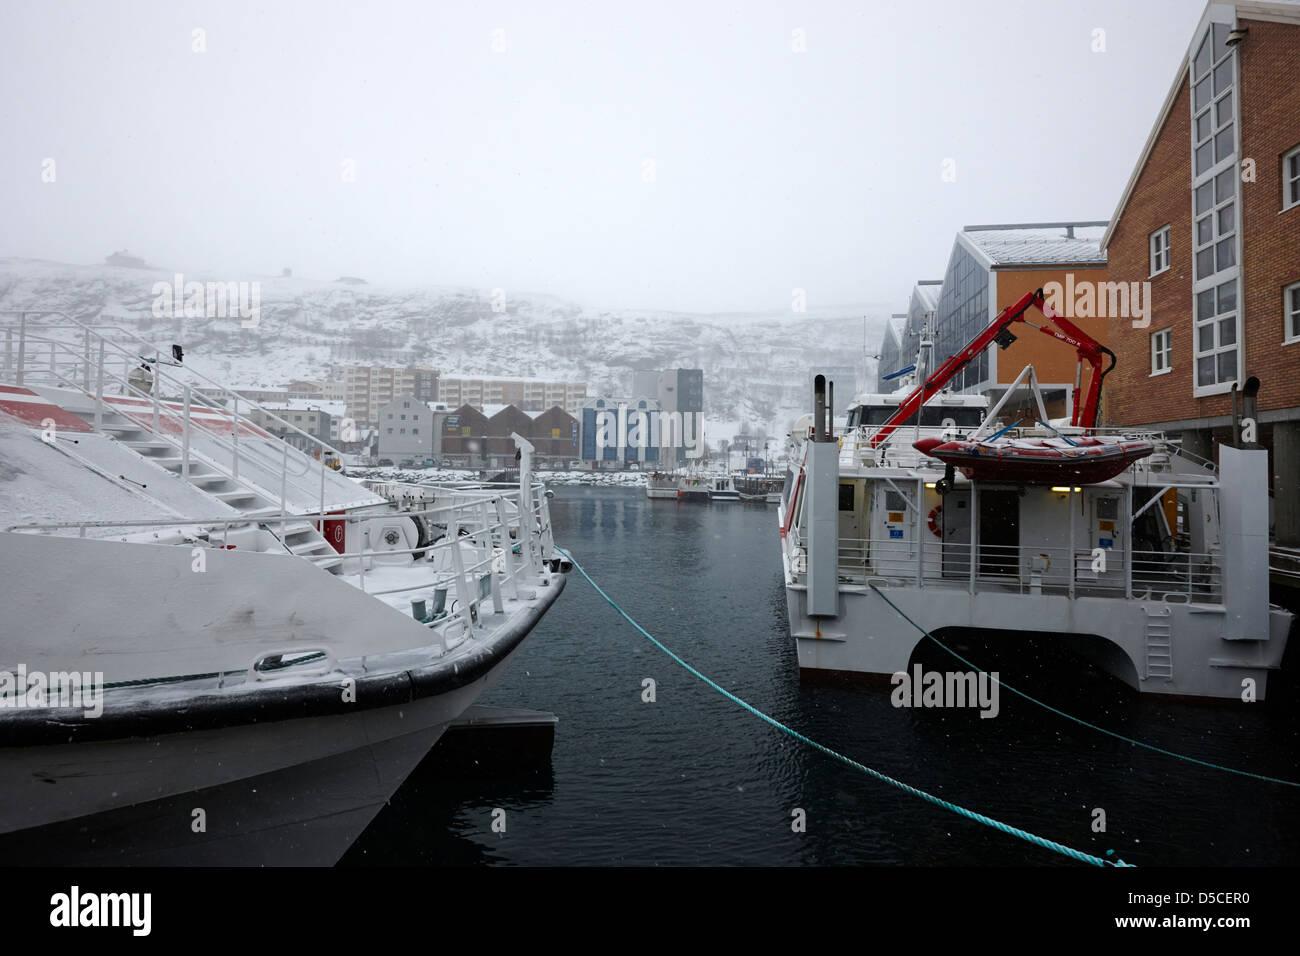 Modern Fast Catamaran Ferries Tied Up In Bad Weather Hammerfest